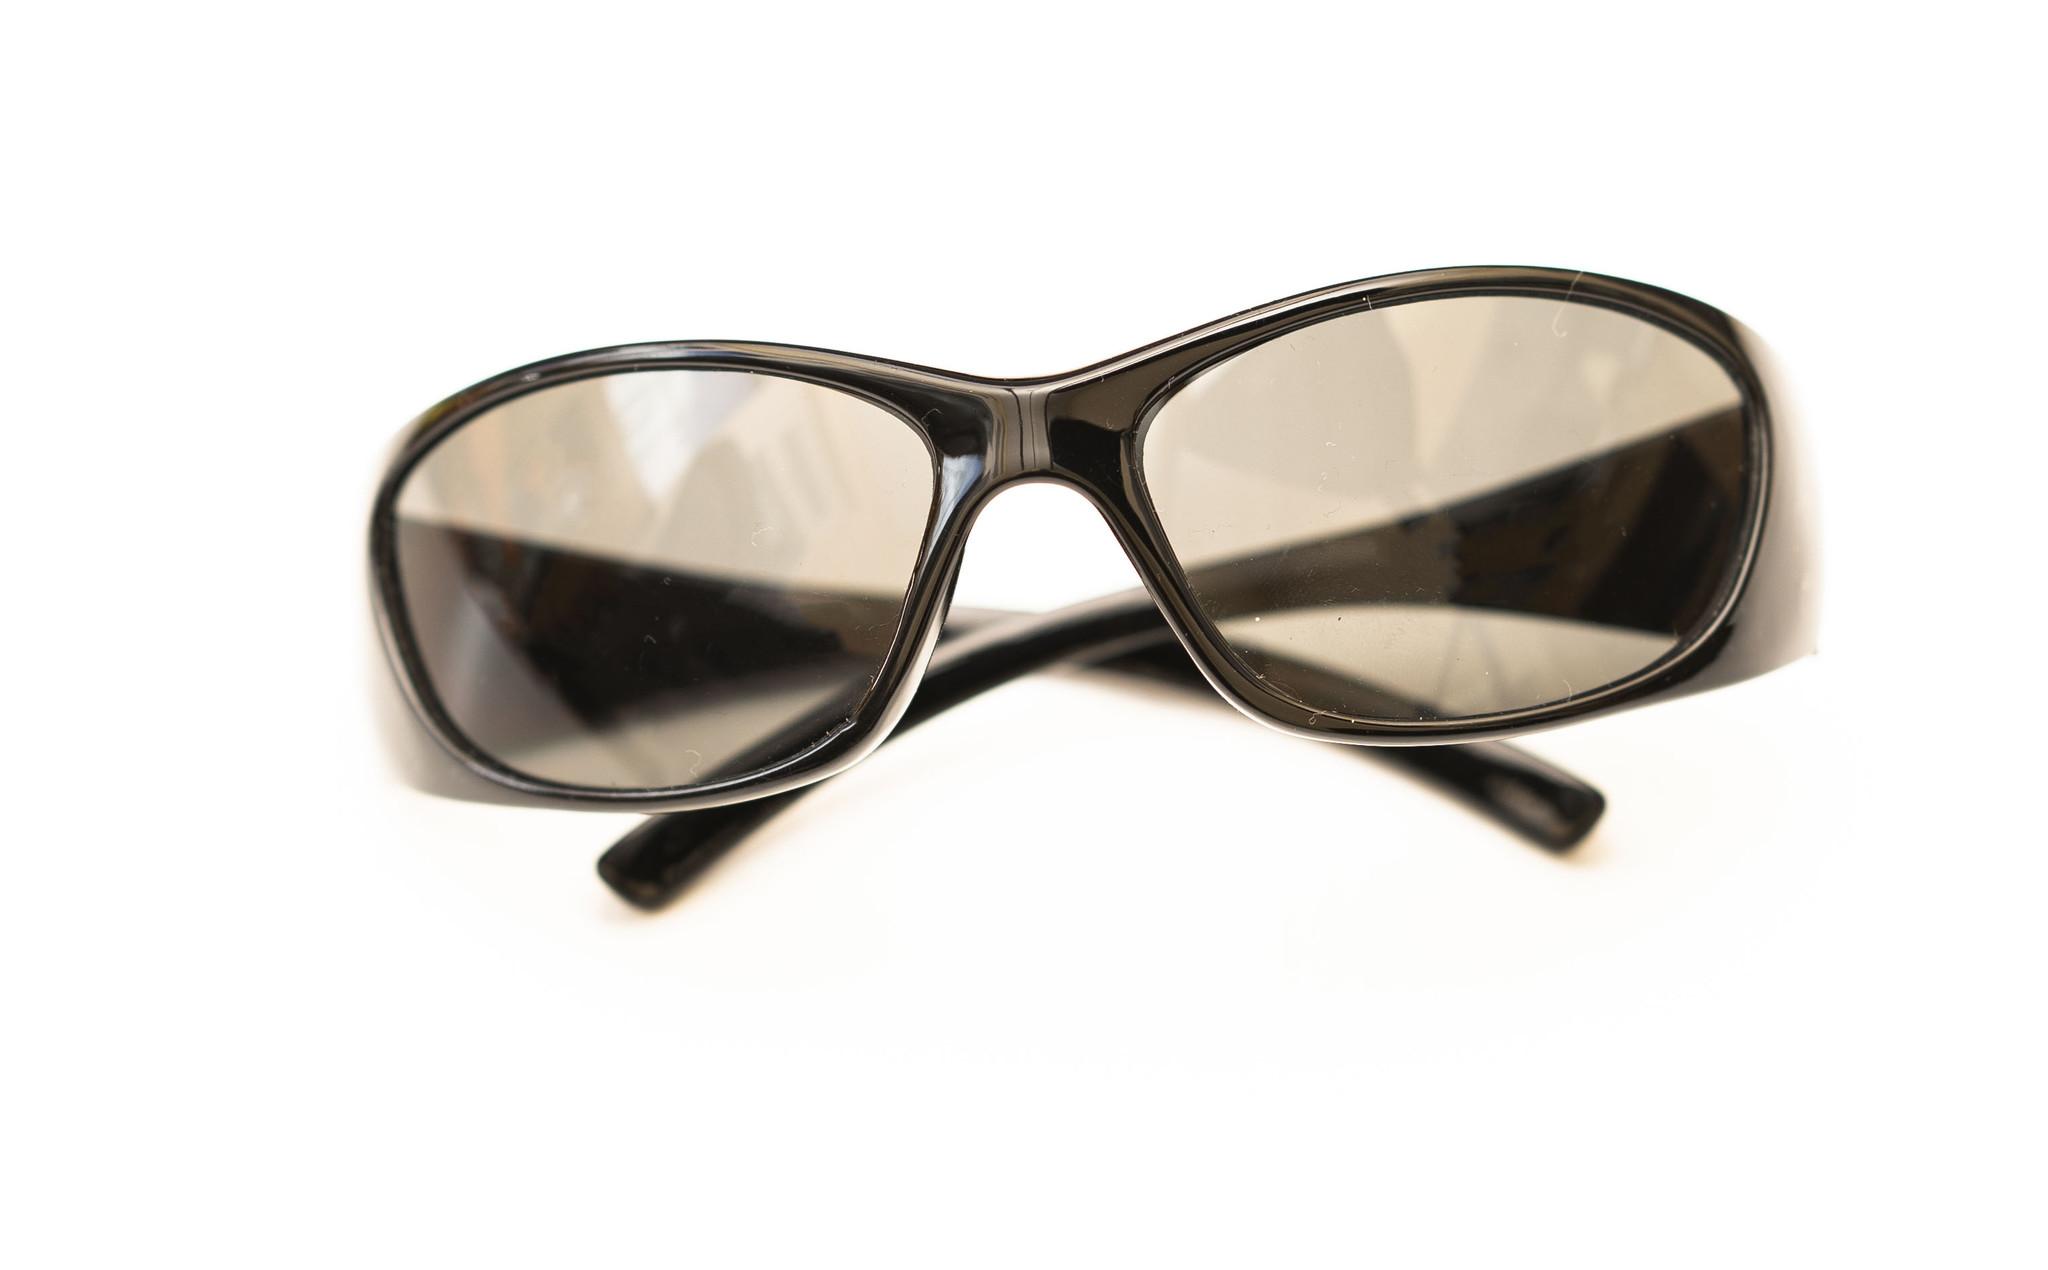 Bubblebum Zonnebril | Kinderzonnebril | Zwart-1